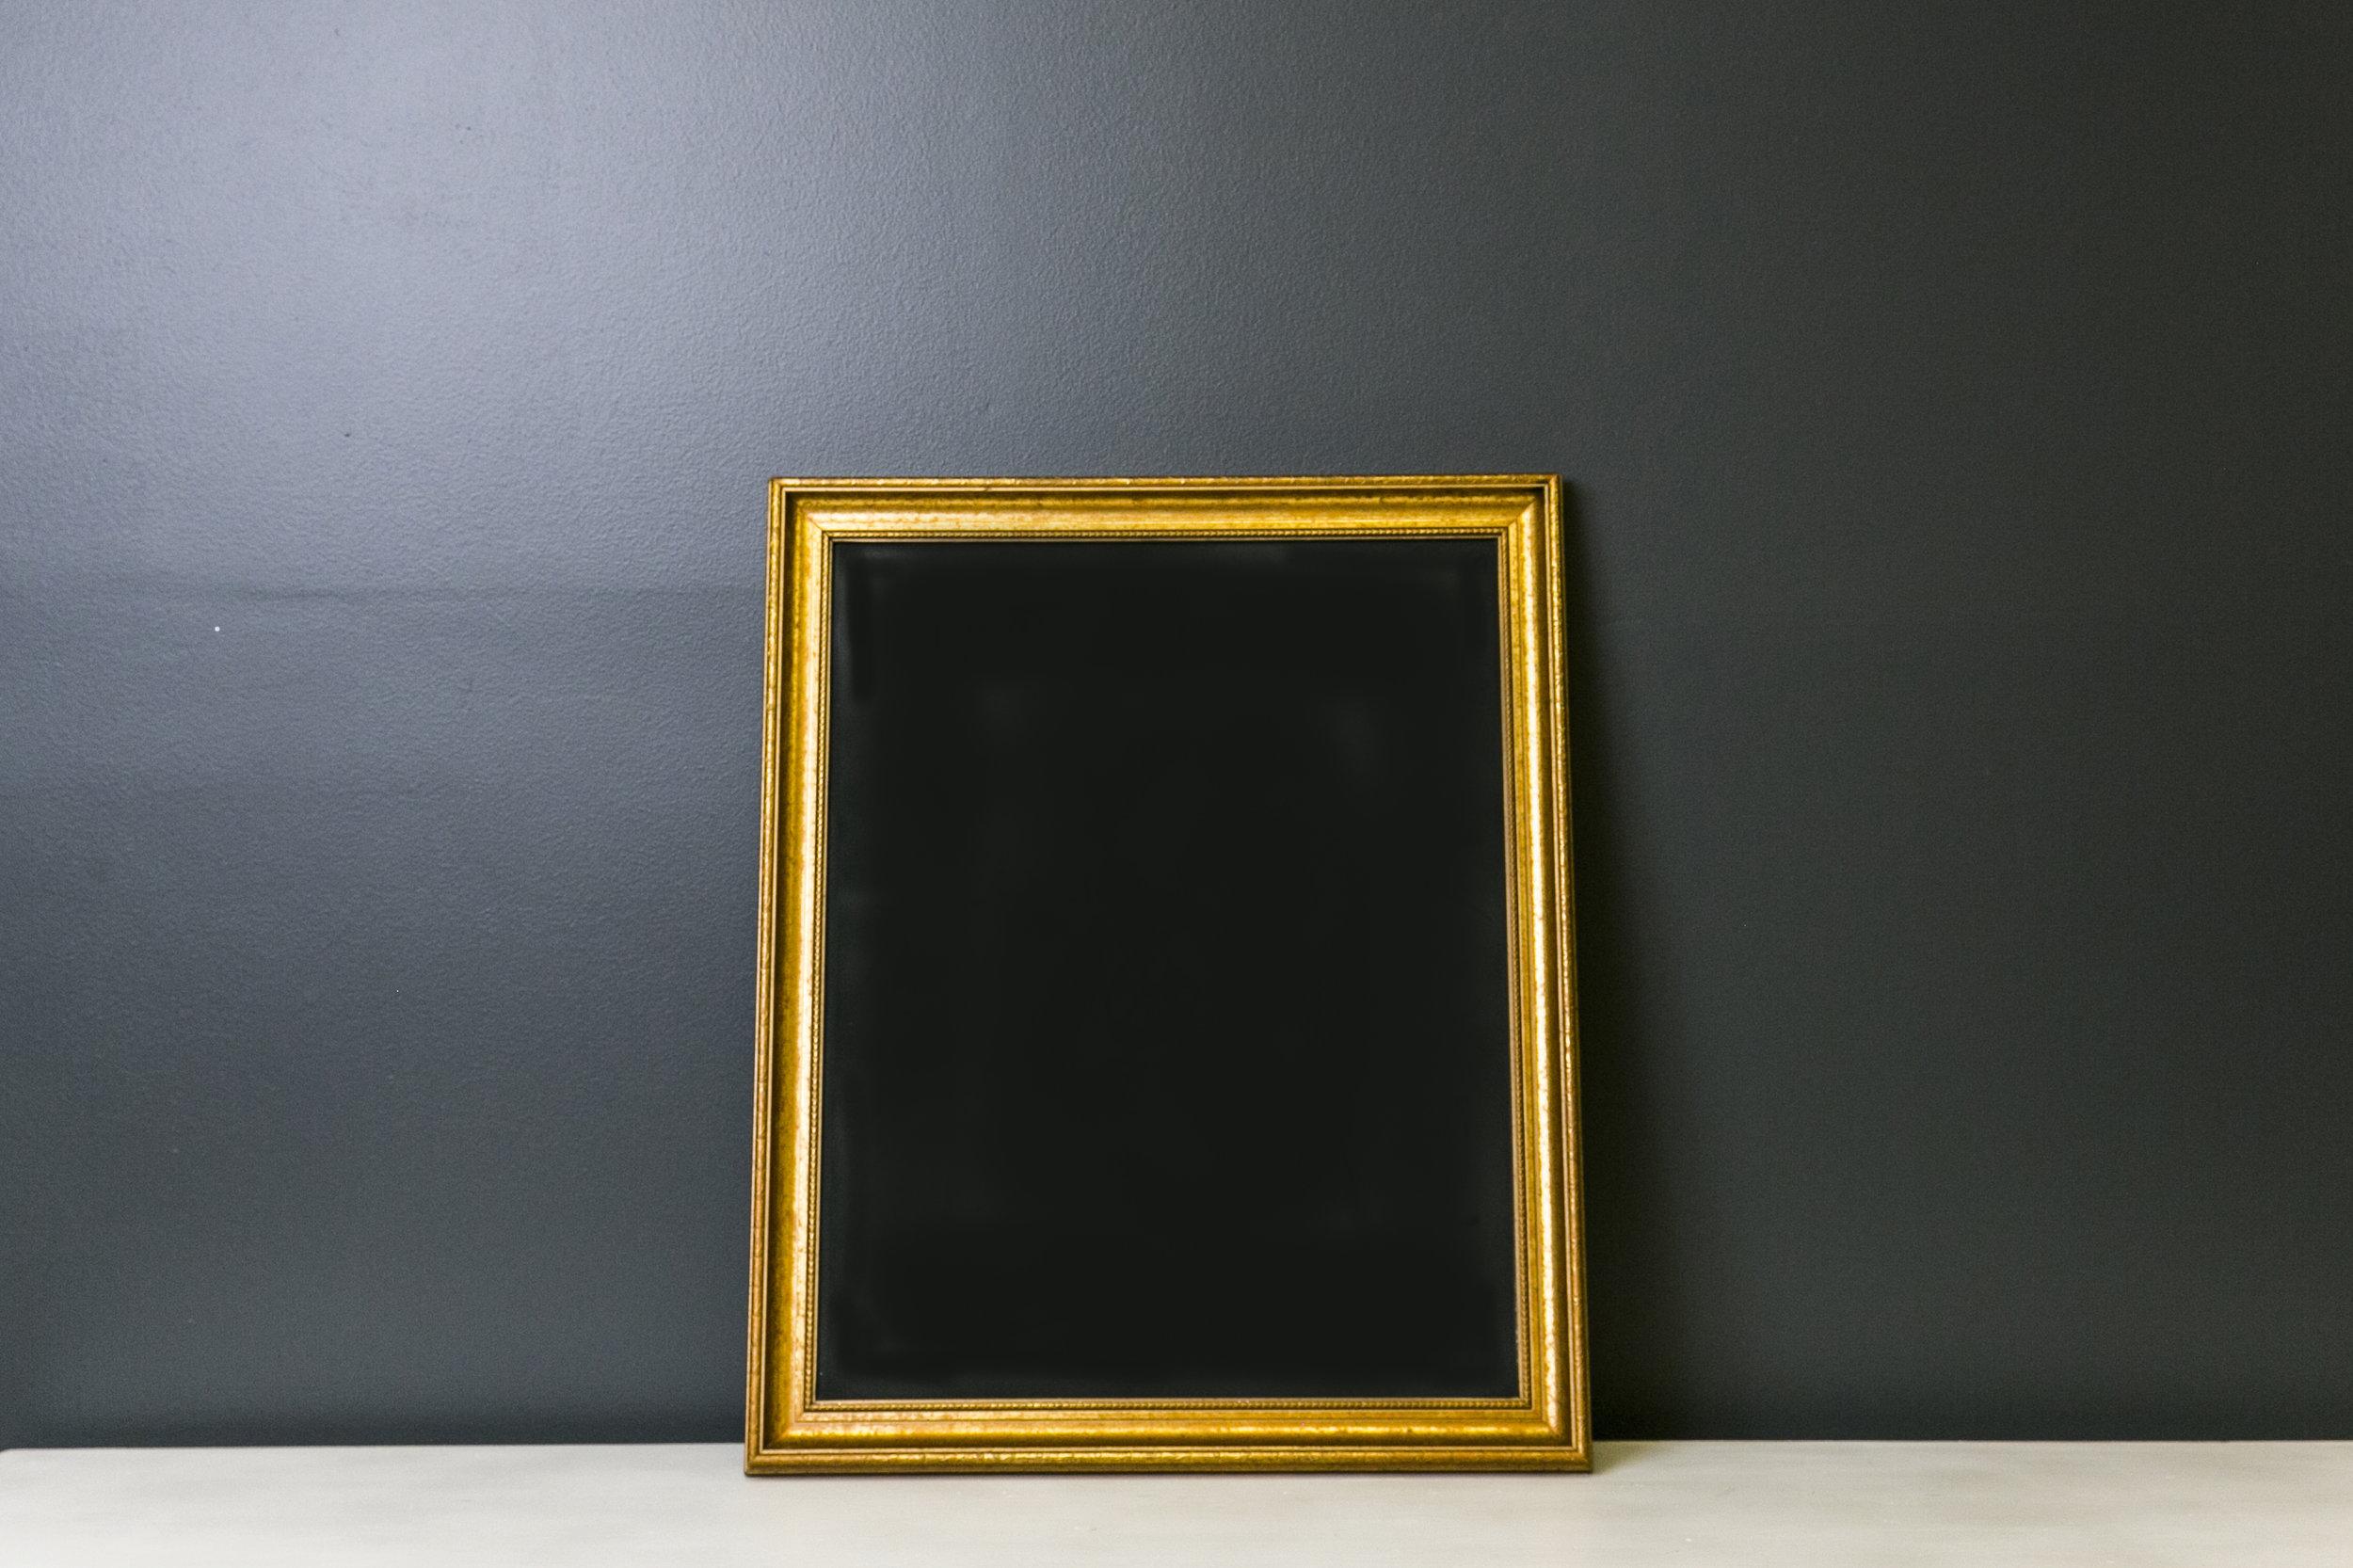 Matilda Large Chalkboard . 27 x 21